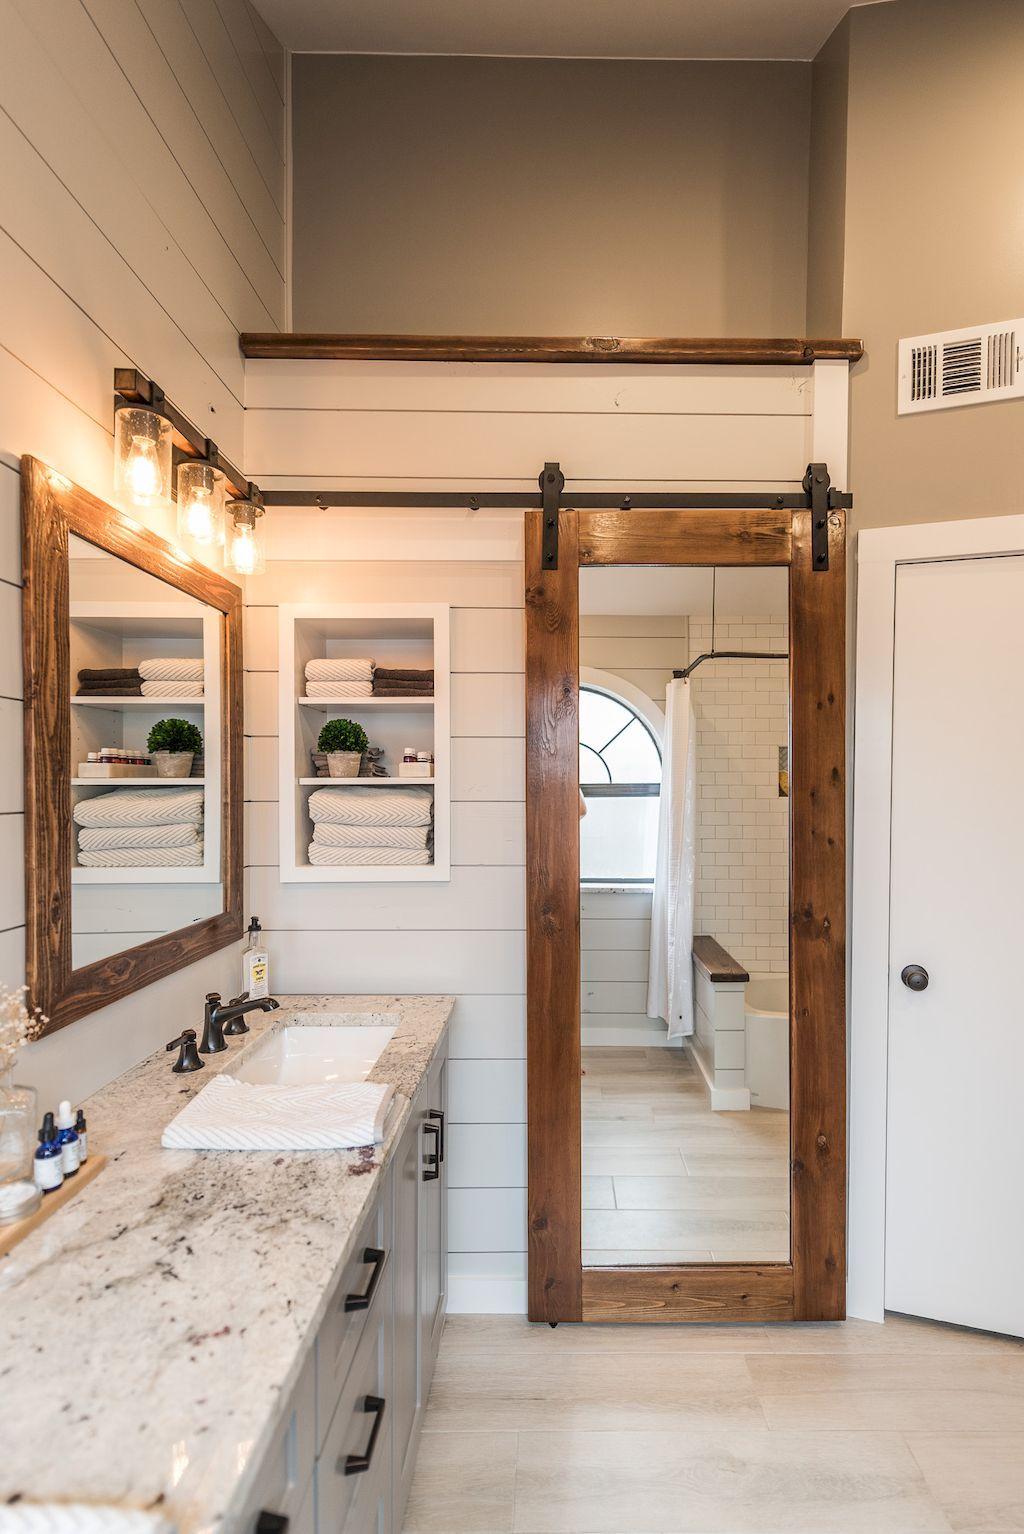 85 Beautiful Farmhouse Bathroom Remodel Decor Ideas | Innen außen ...